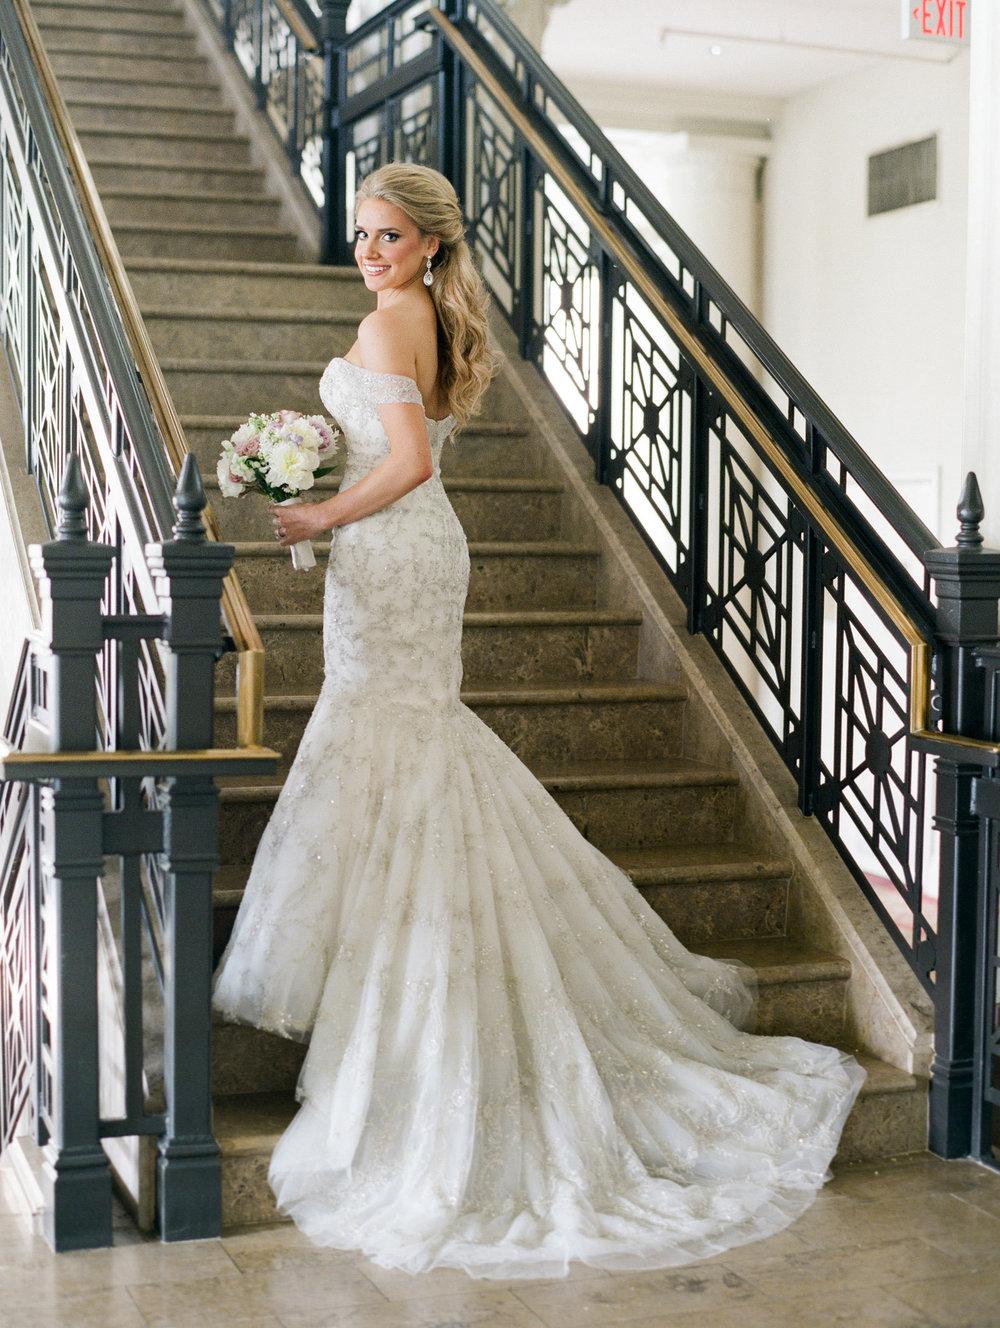 0064_0078_Houston-The-Corinthian-Bridal-Photographer.jpg